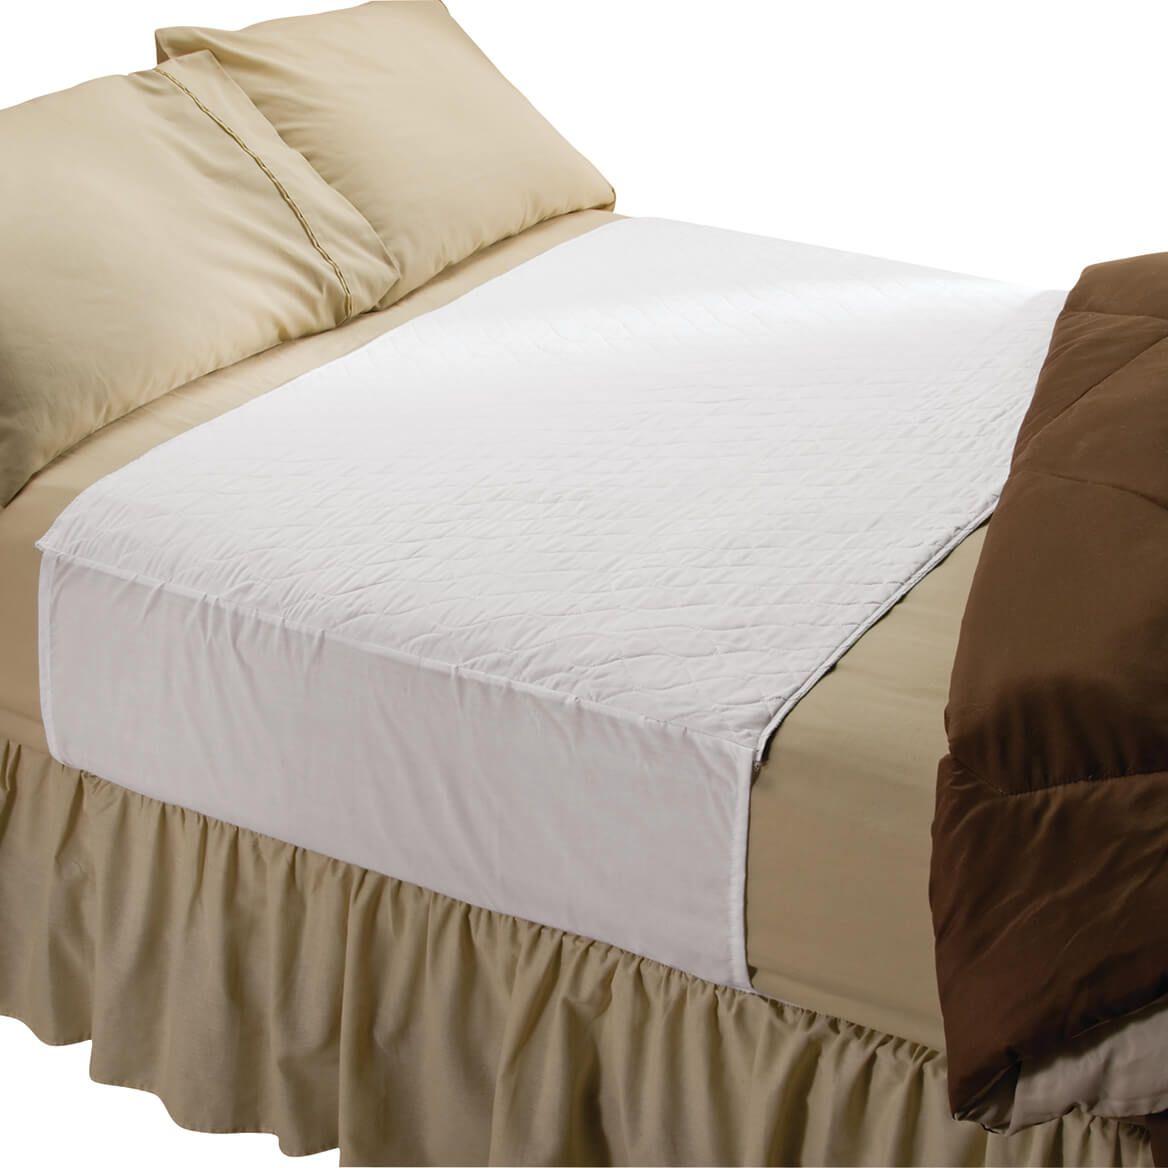 Reusable Waterproof Bed Pad-359458